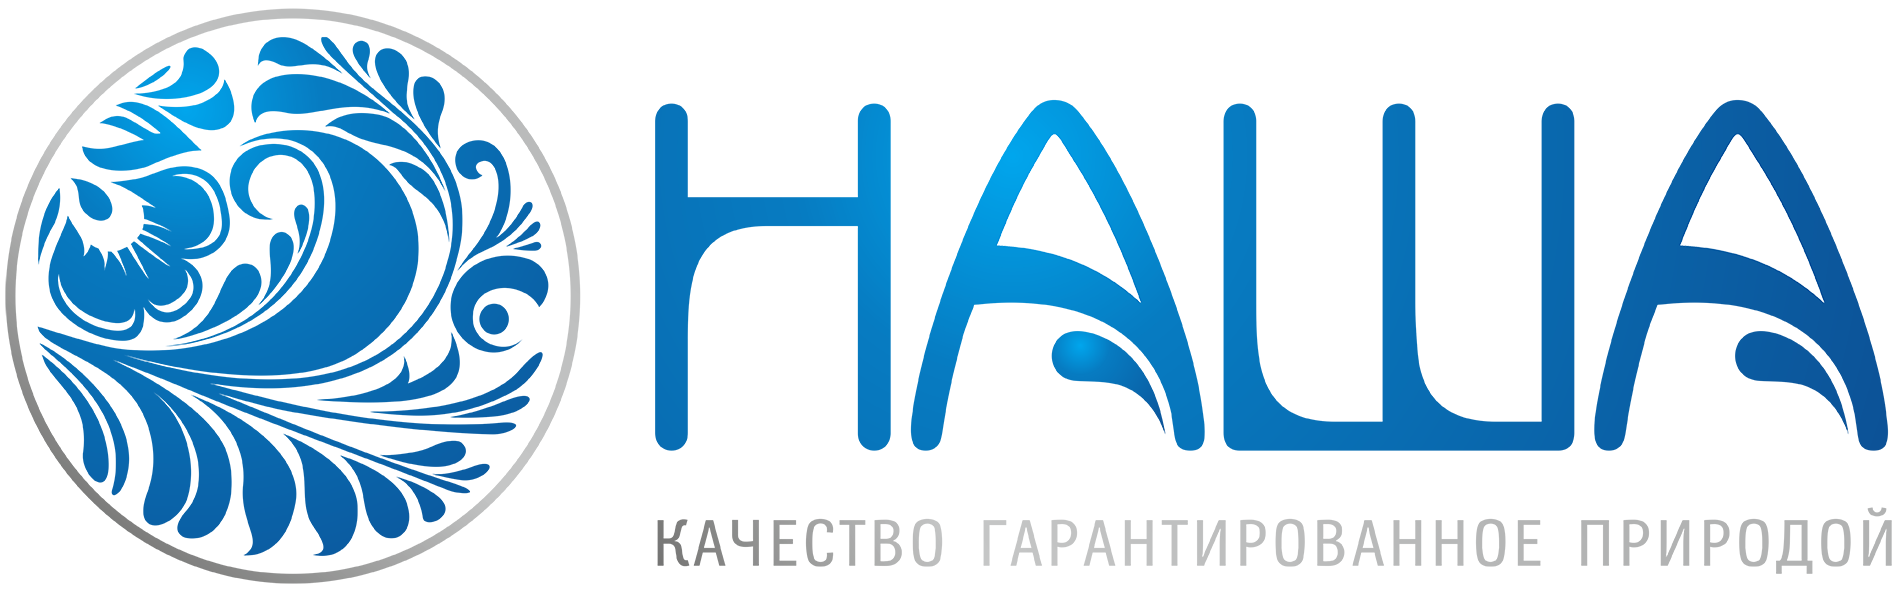 Voda-Nasha.RU